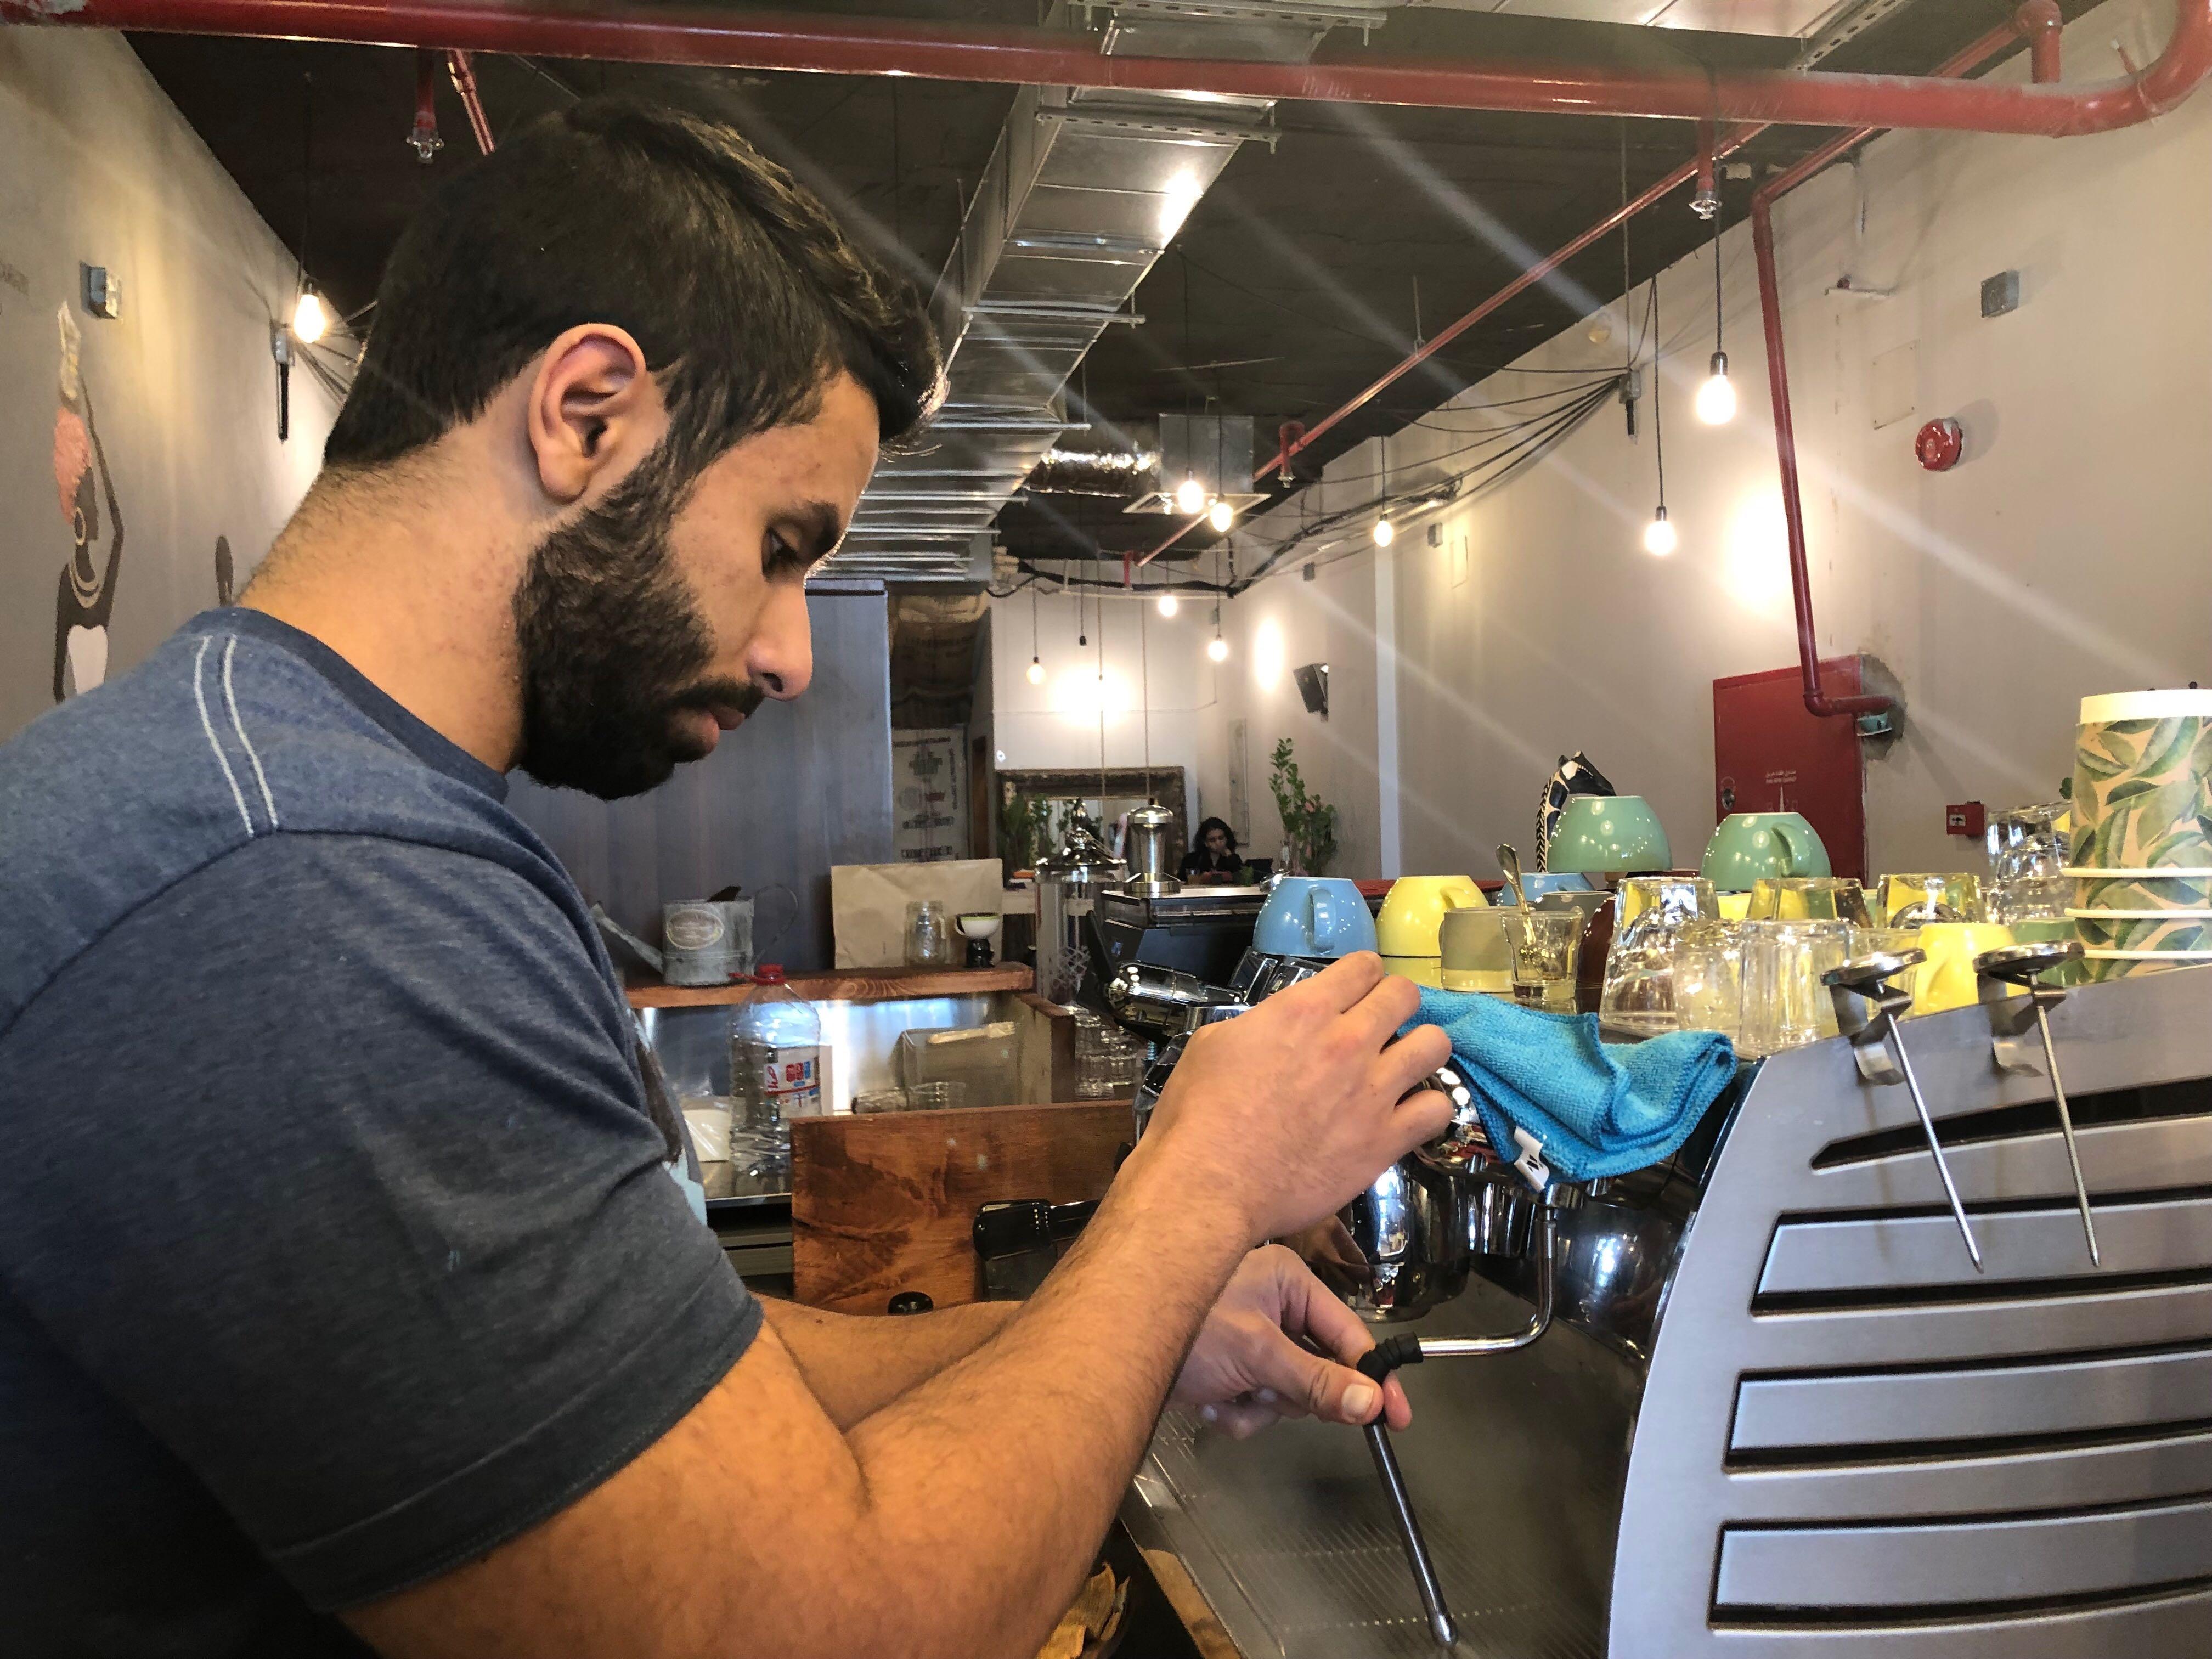 A beared man wearing a blue t-shirt works the espresso machine.